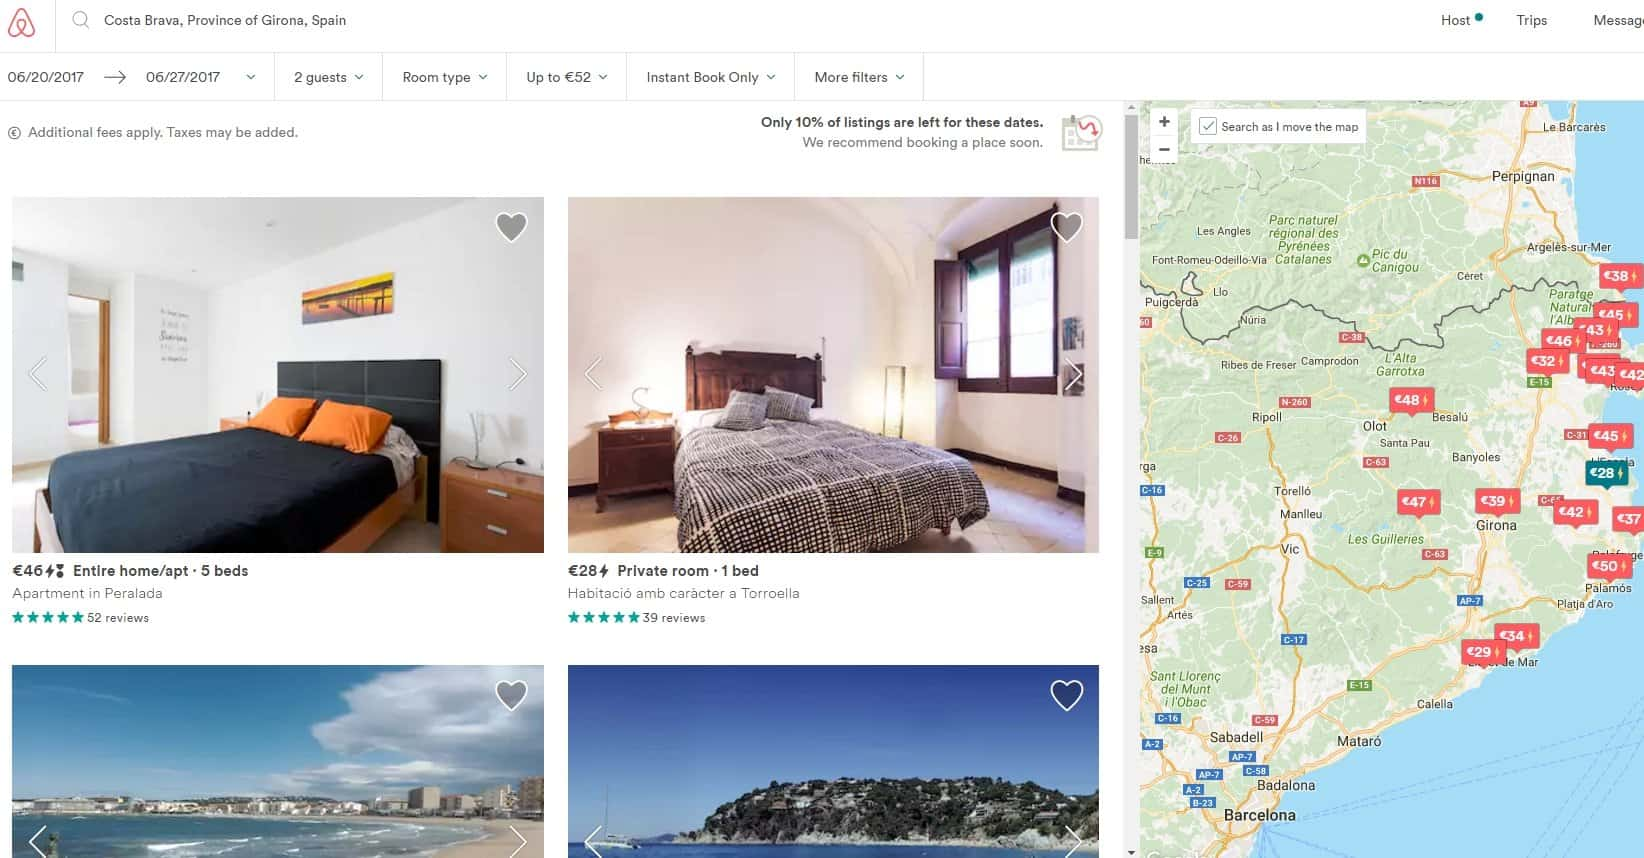 Сайт Airbnb - страница поиска